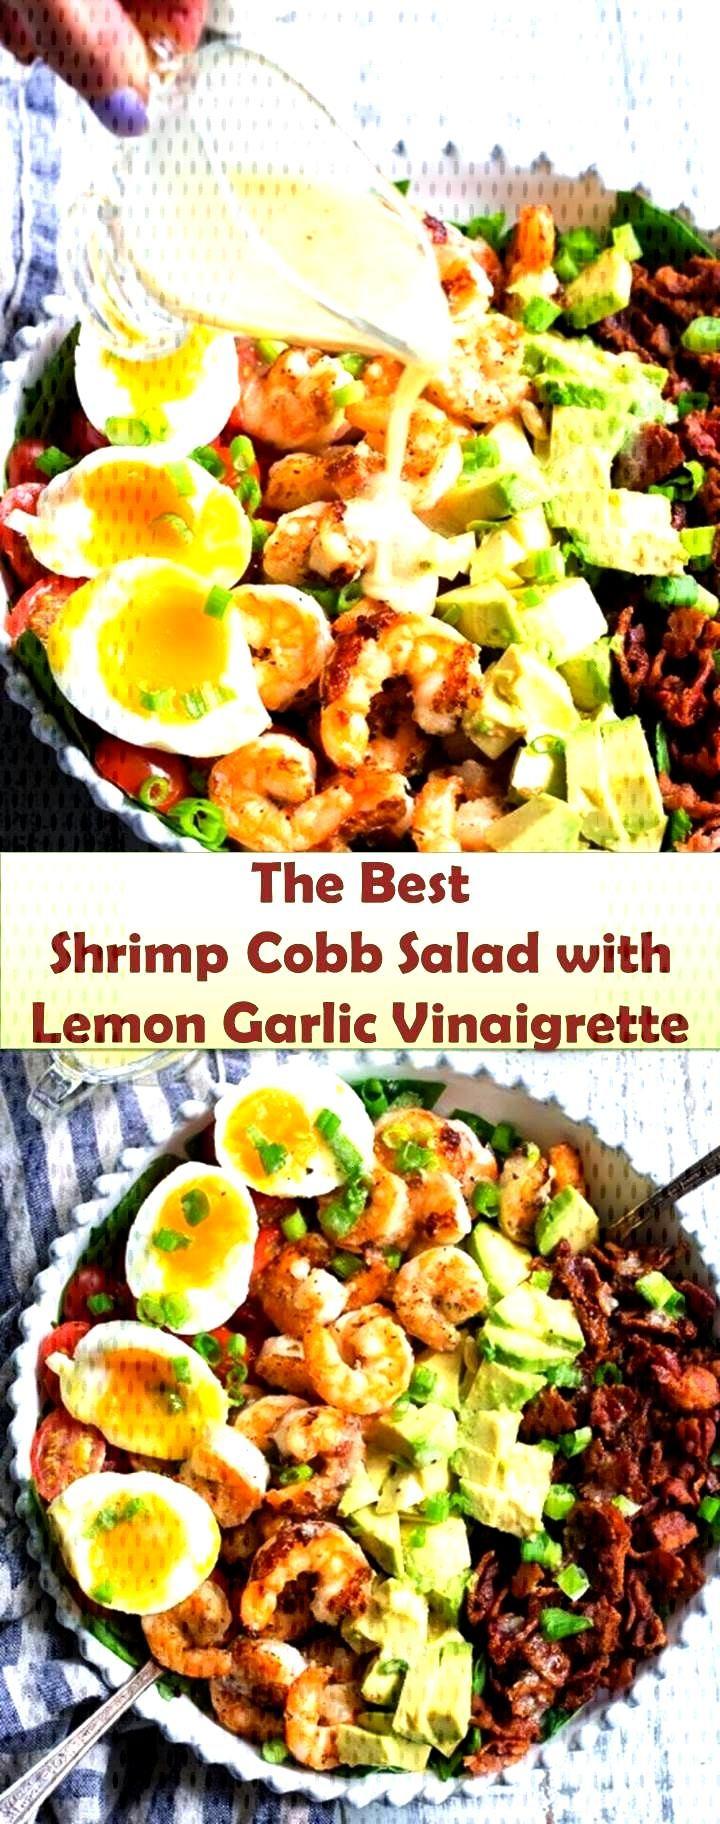 946 Reviews Your family s favorite food and drink ! Shrimp Cobb Salad with Lemon Garlic Vinaigret